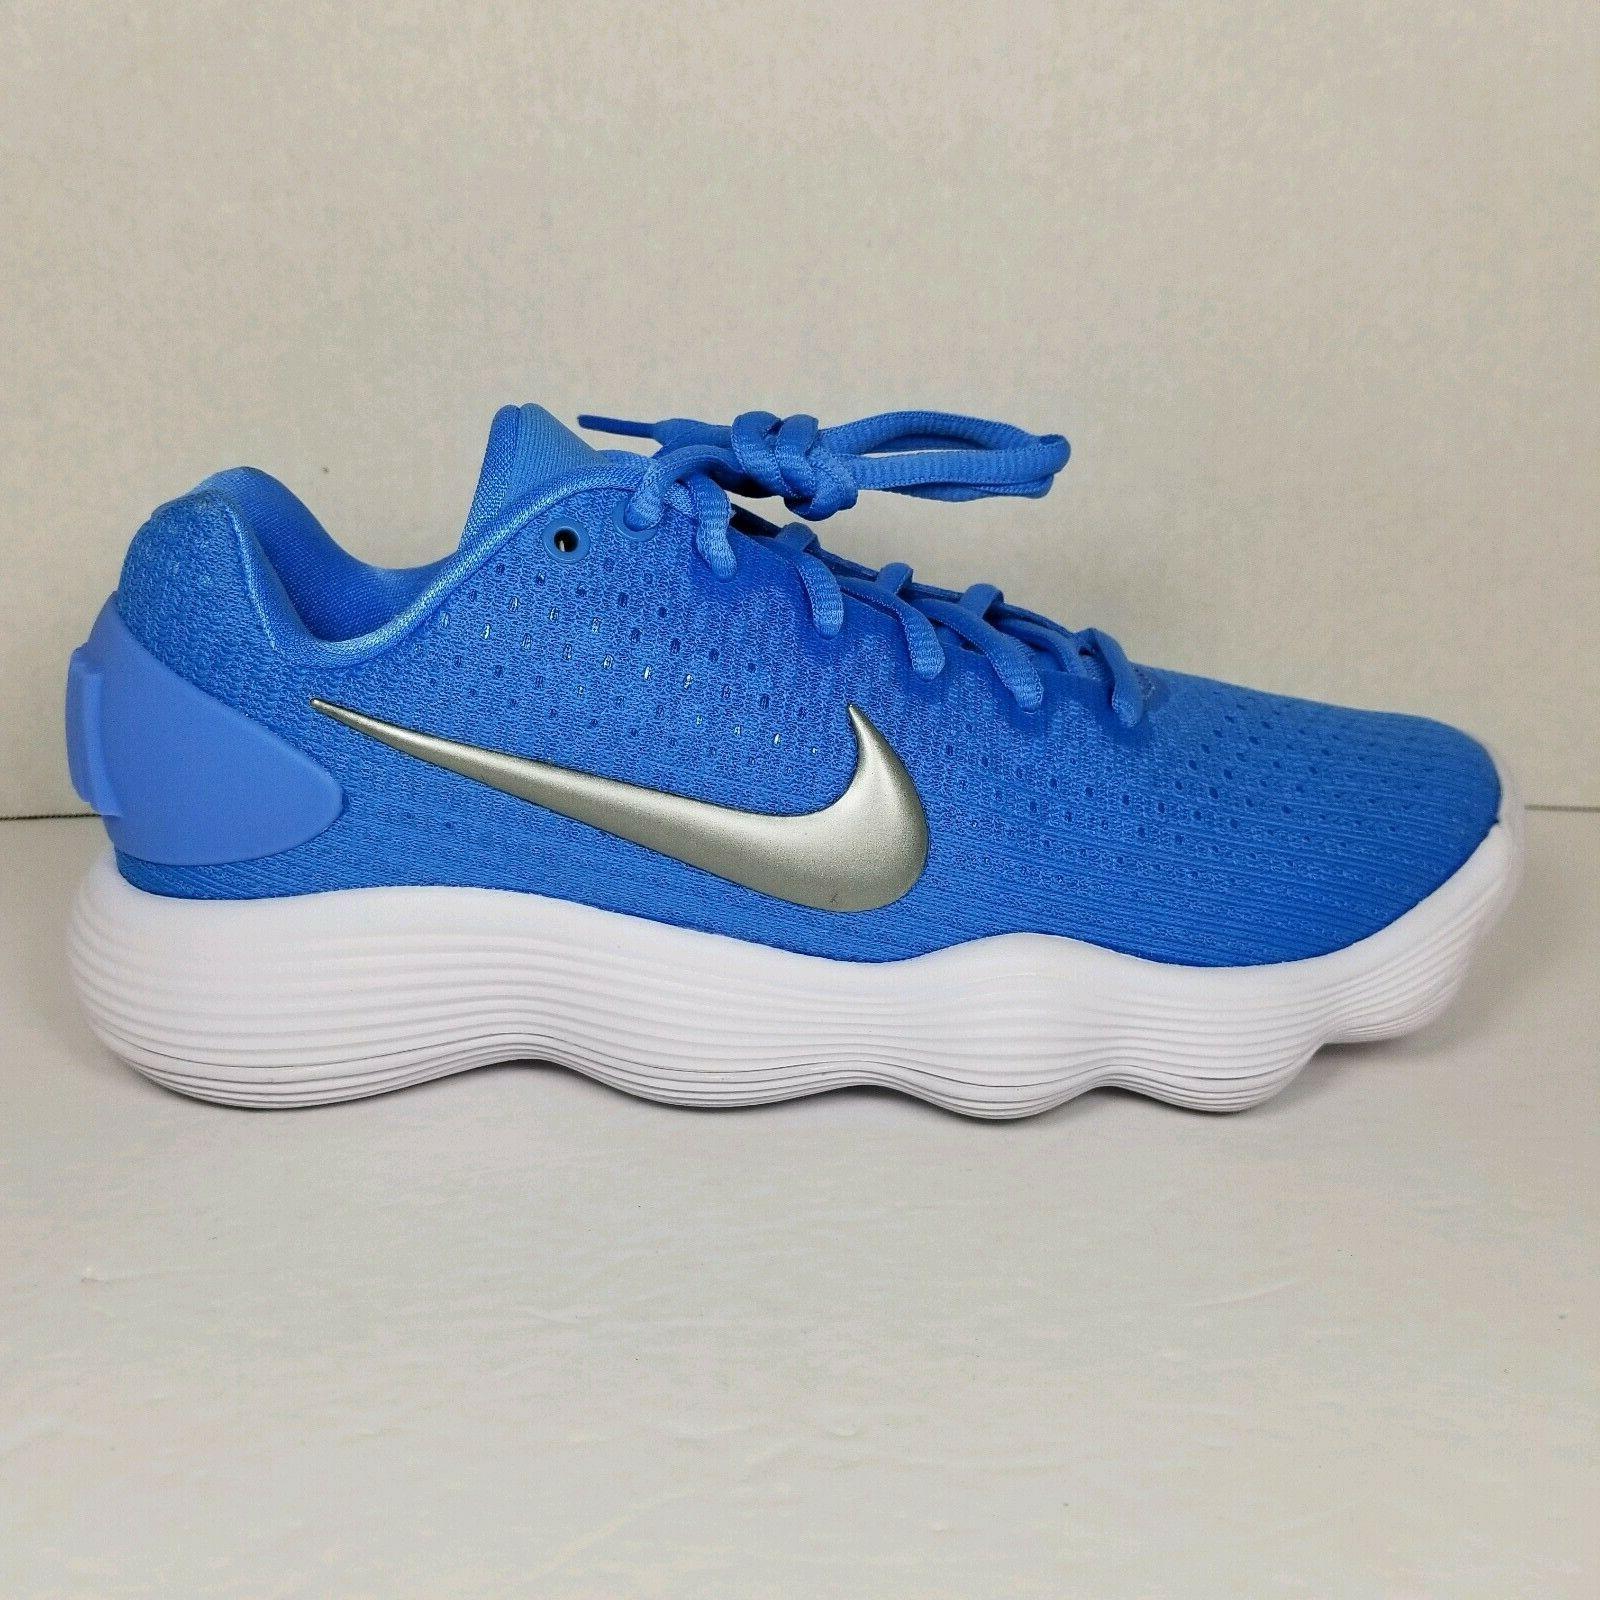 Nike Hyperdunk Blue Shoes 942774-406 Size 14